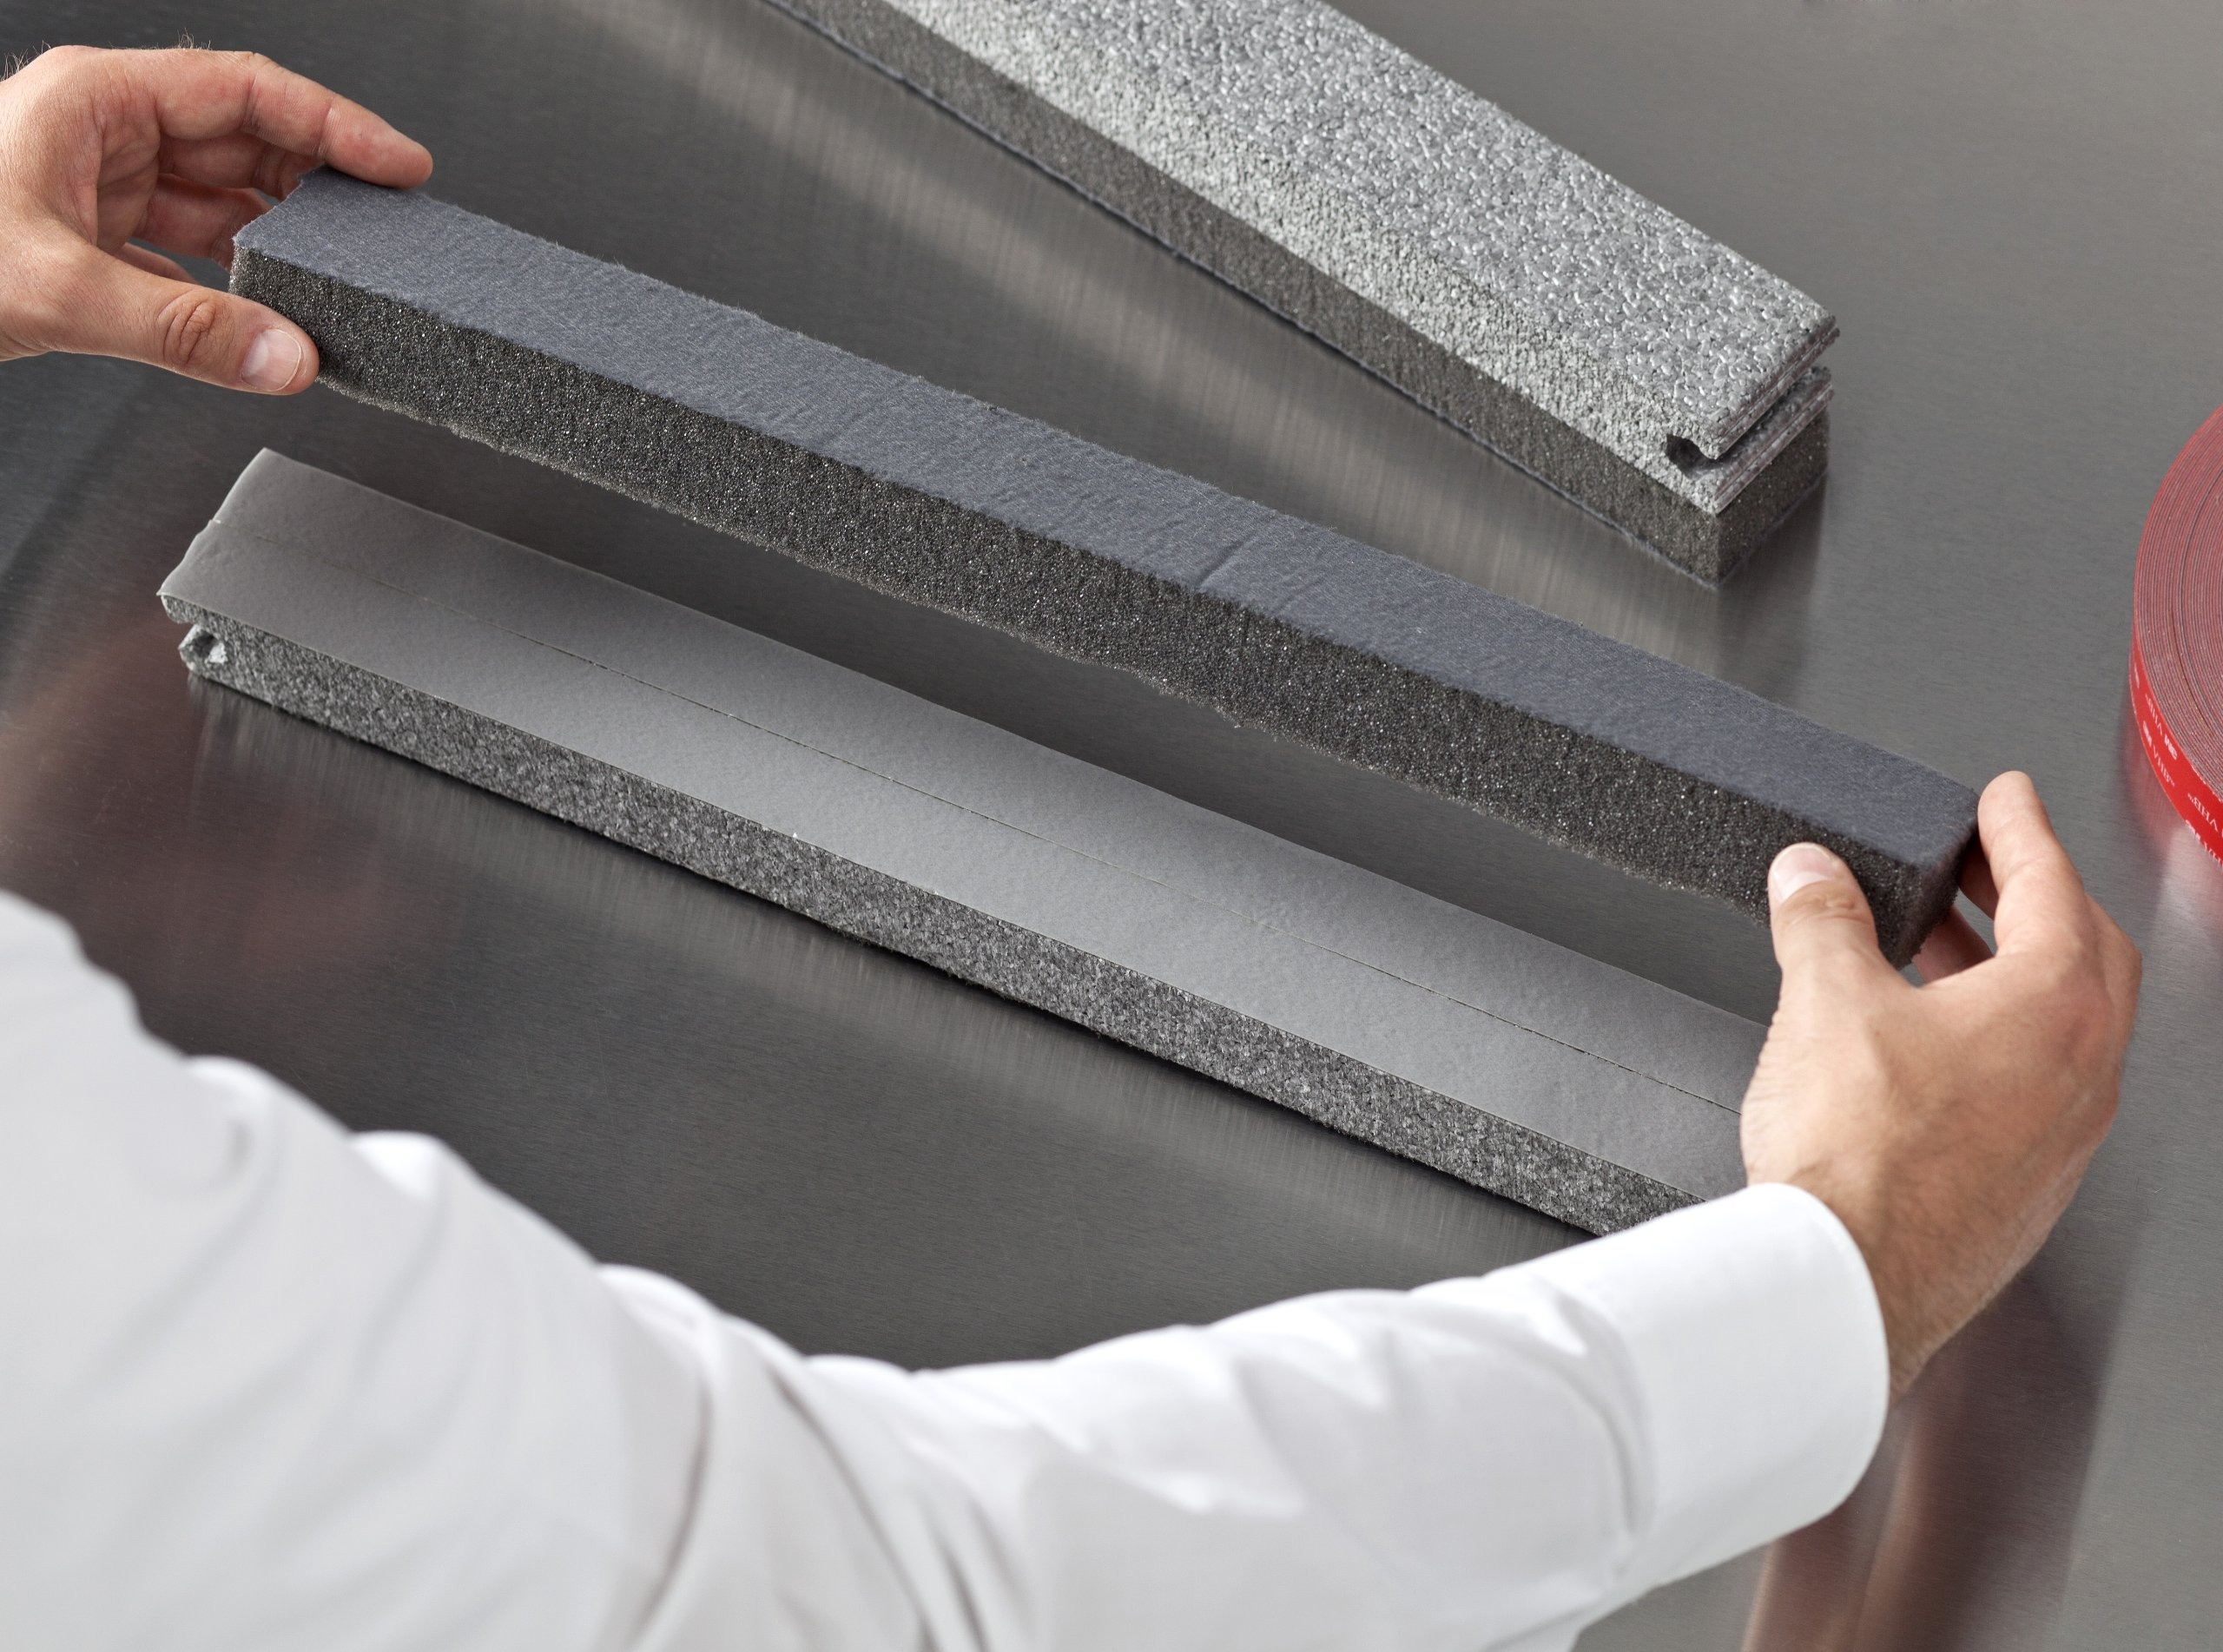 3M VHB 7000072418 Cinta Adhesiva para Materiales Diferentes Combinados, 19 mm X 3 m, 1.1 mm, 1unidad, Gris